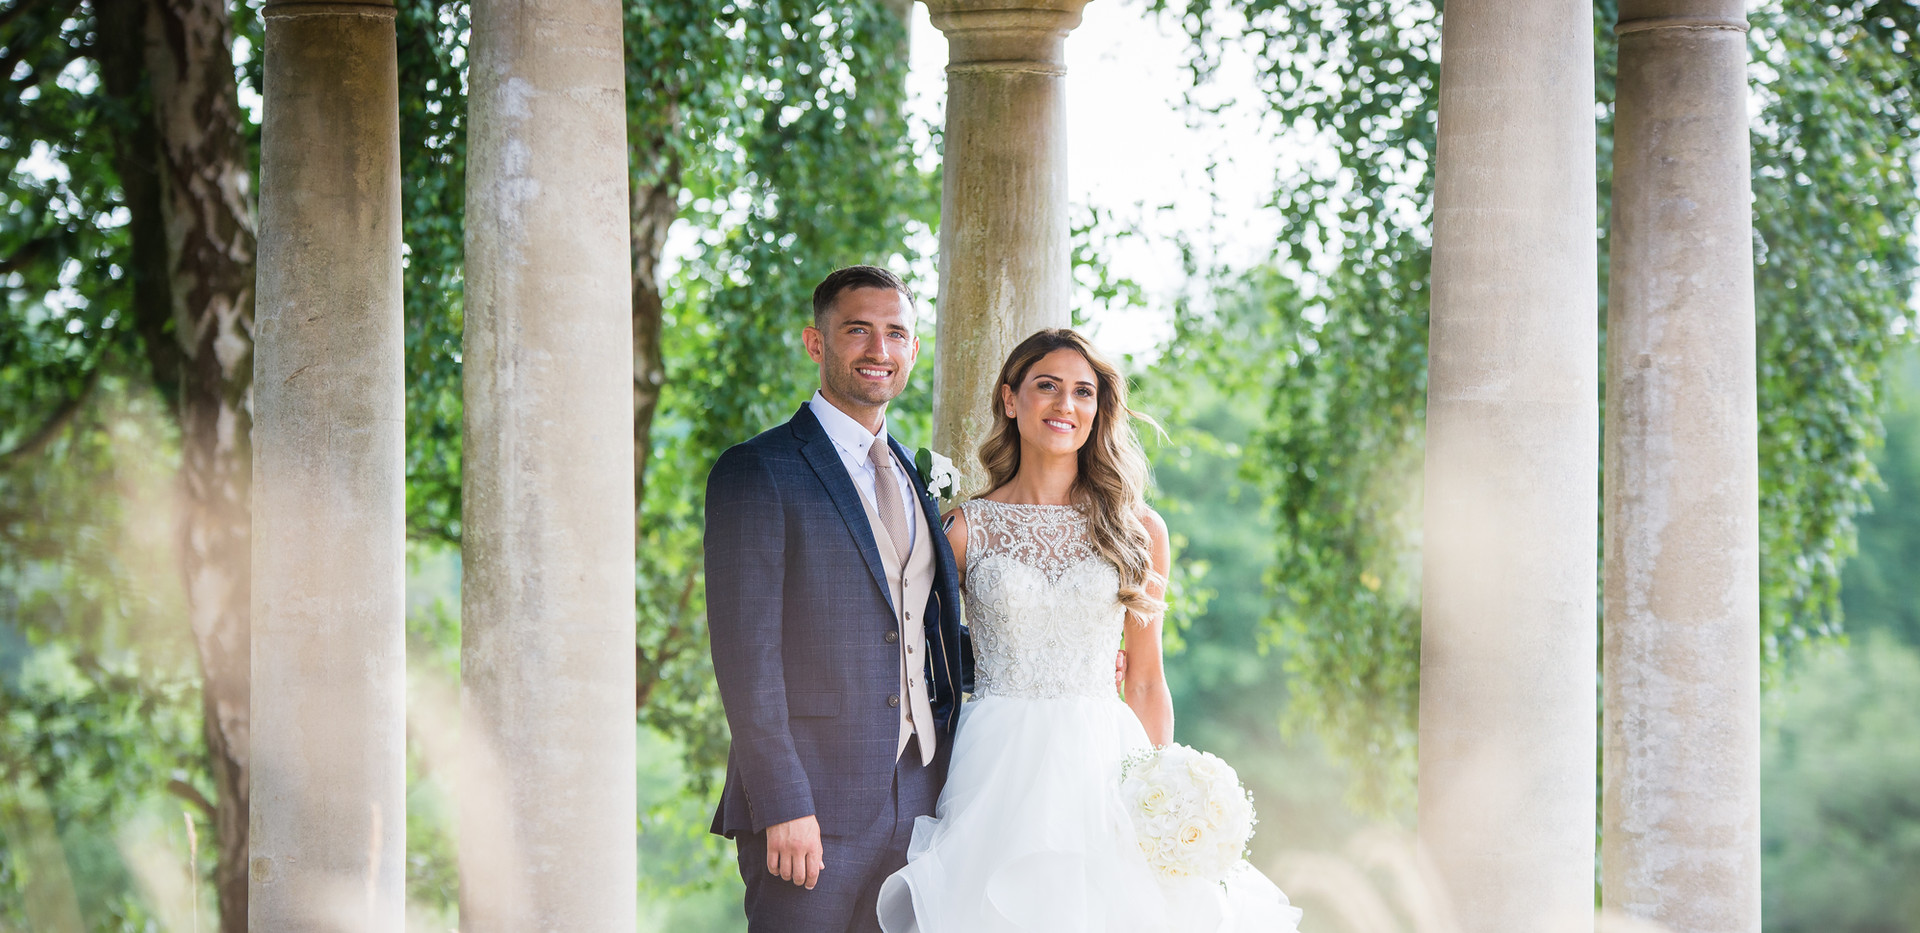 Delamere Manor Wedding Photography___47.